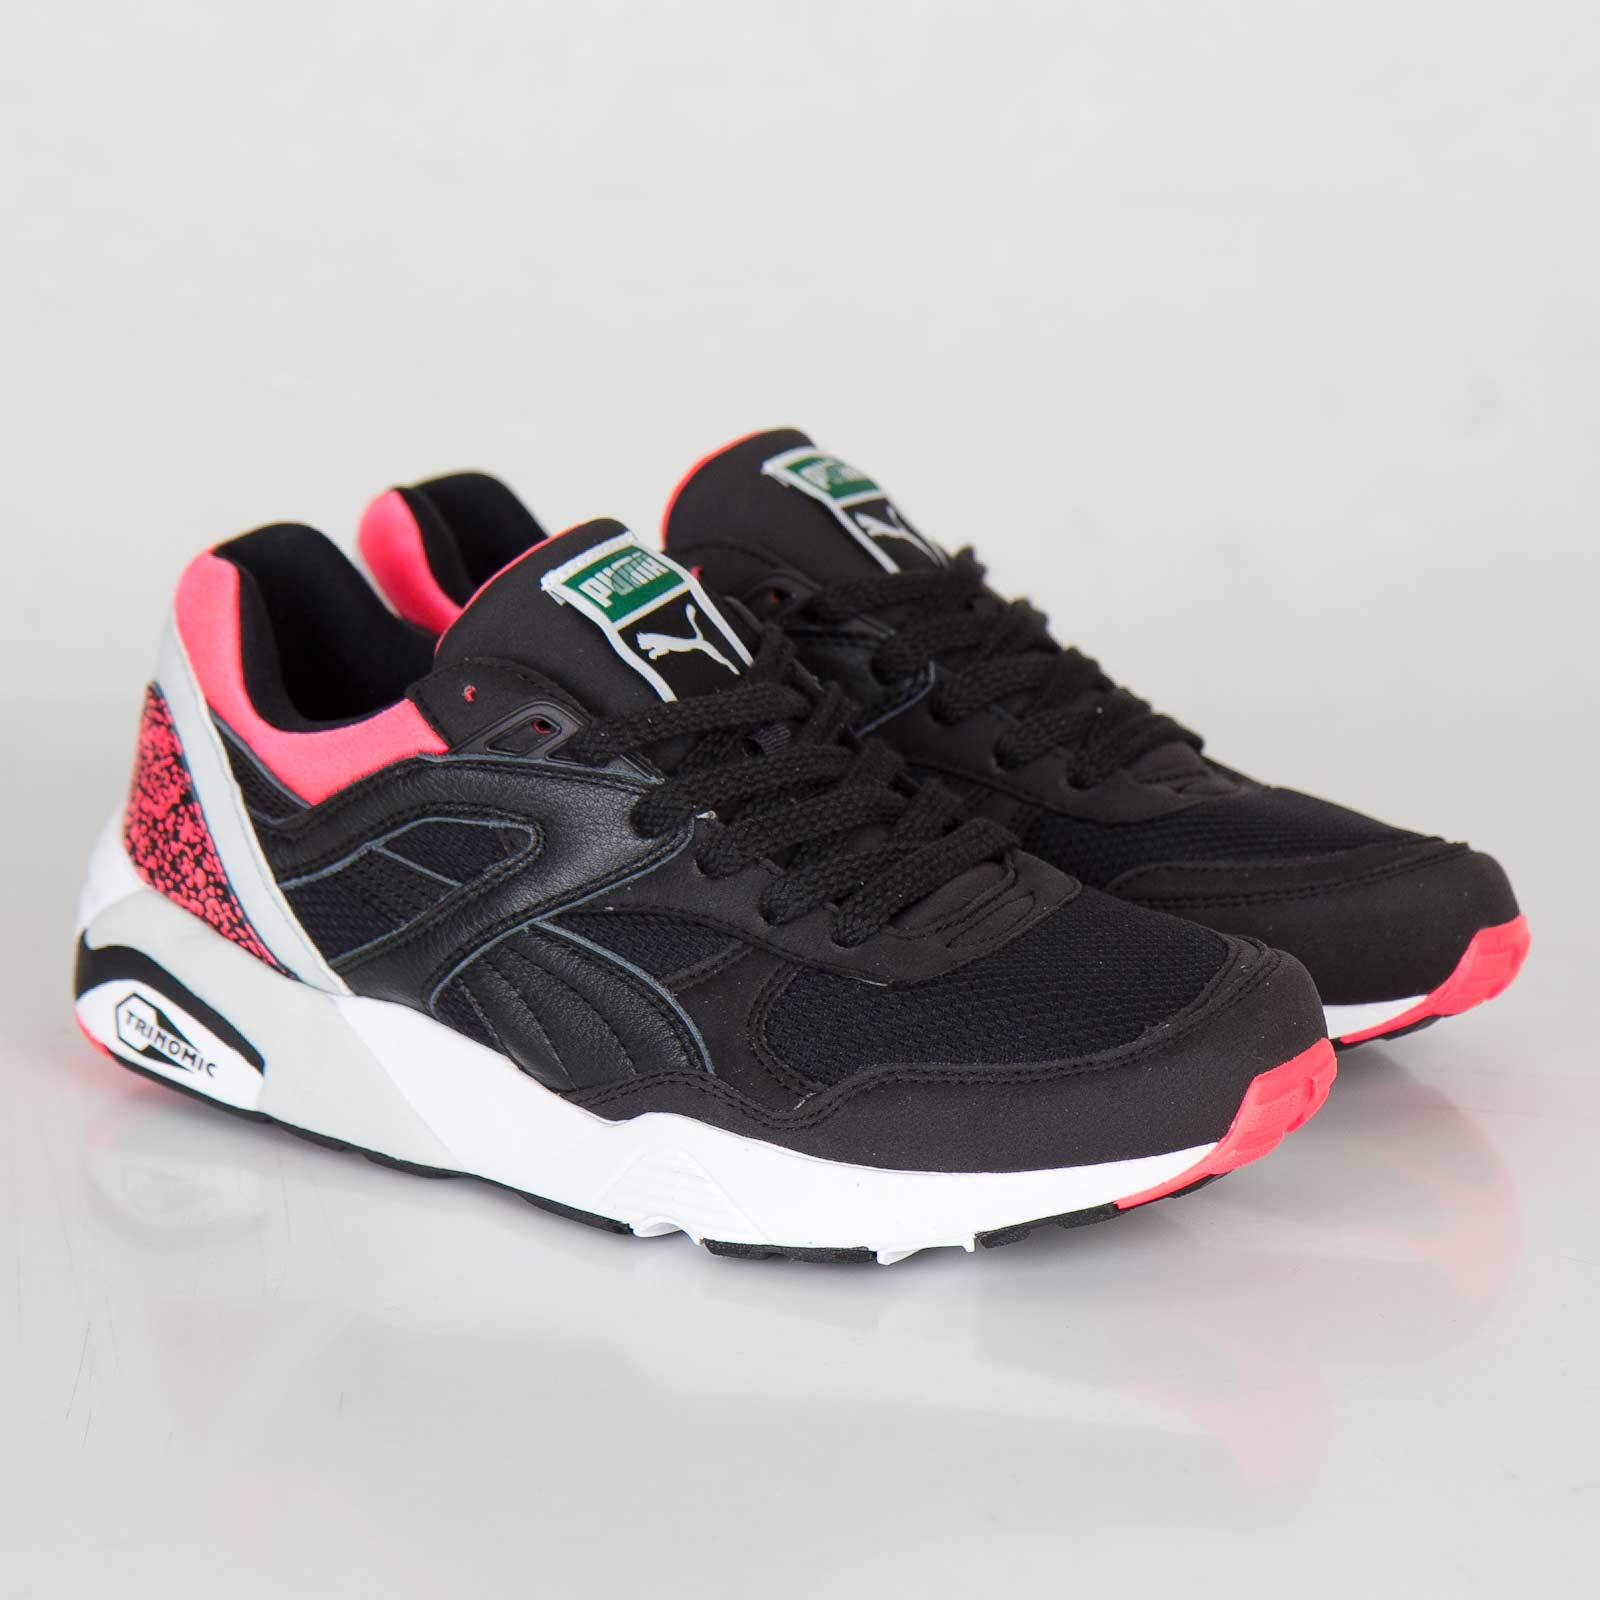 94813cff1d9 Puma R698 OG 93 - 357481-01 - Sneakersnstuff